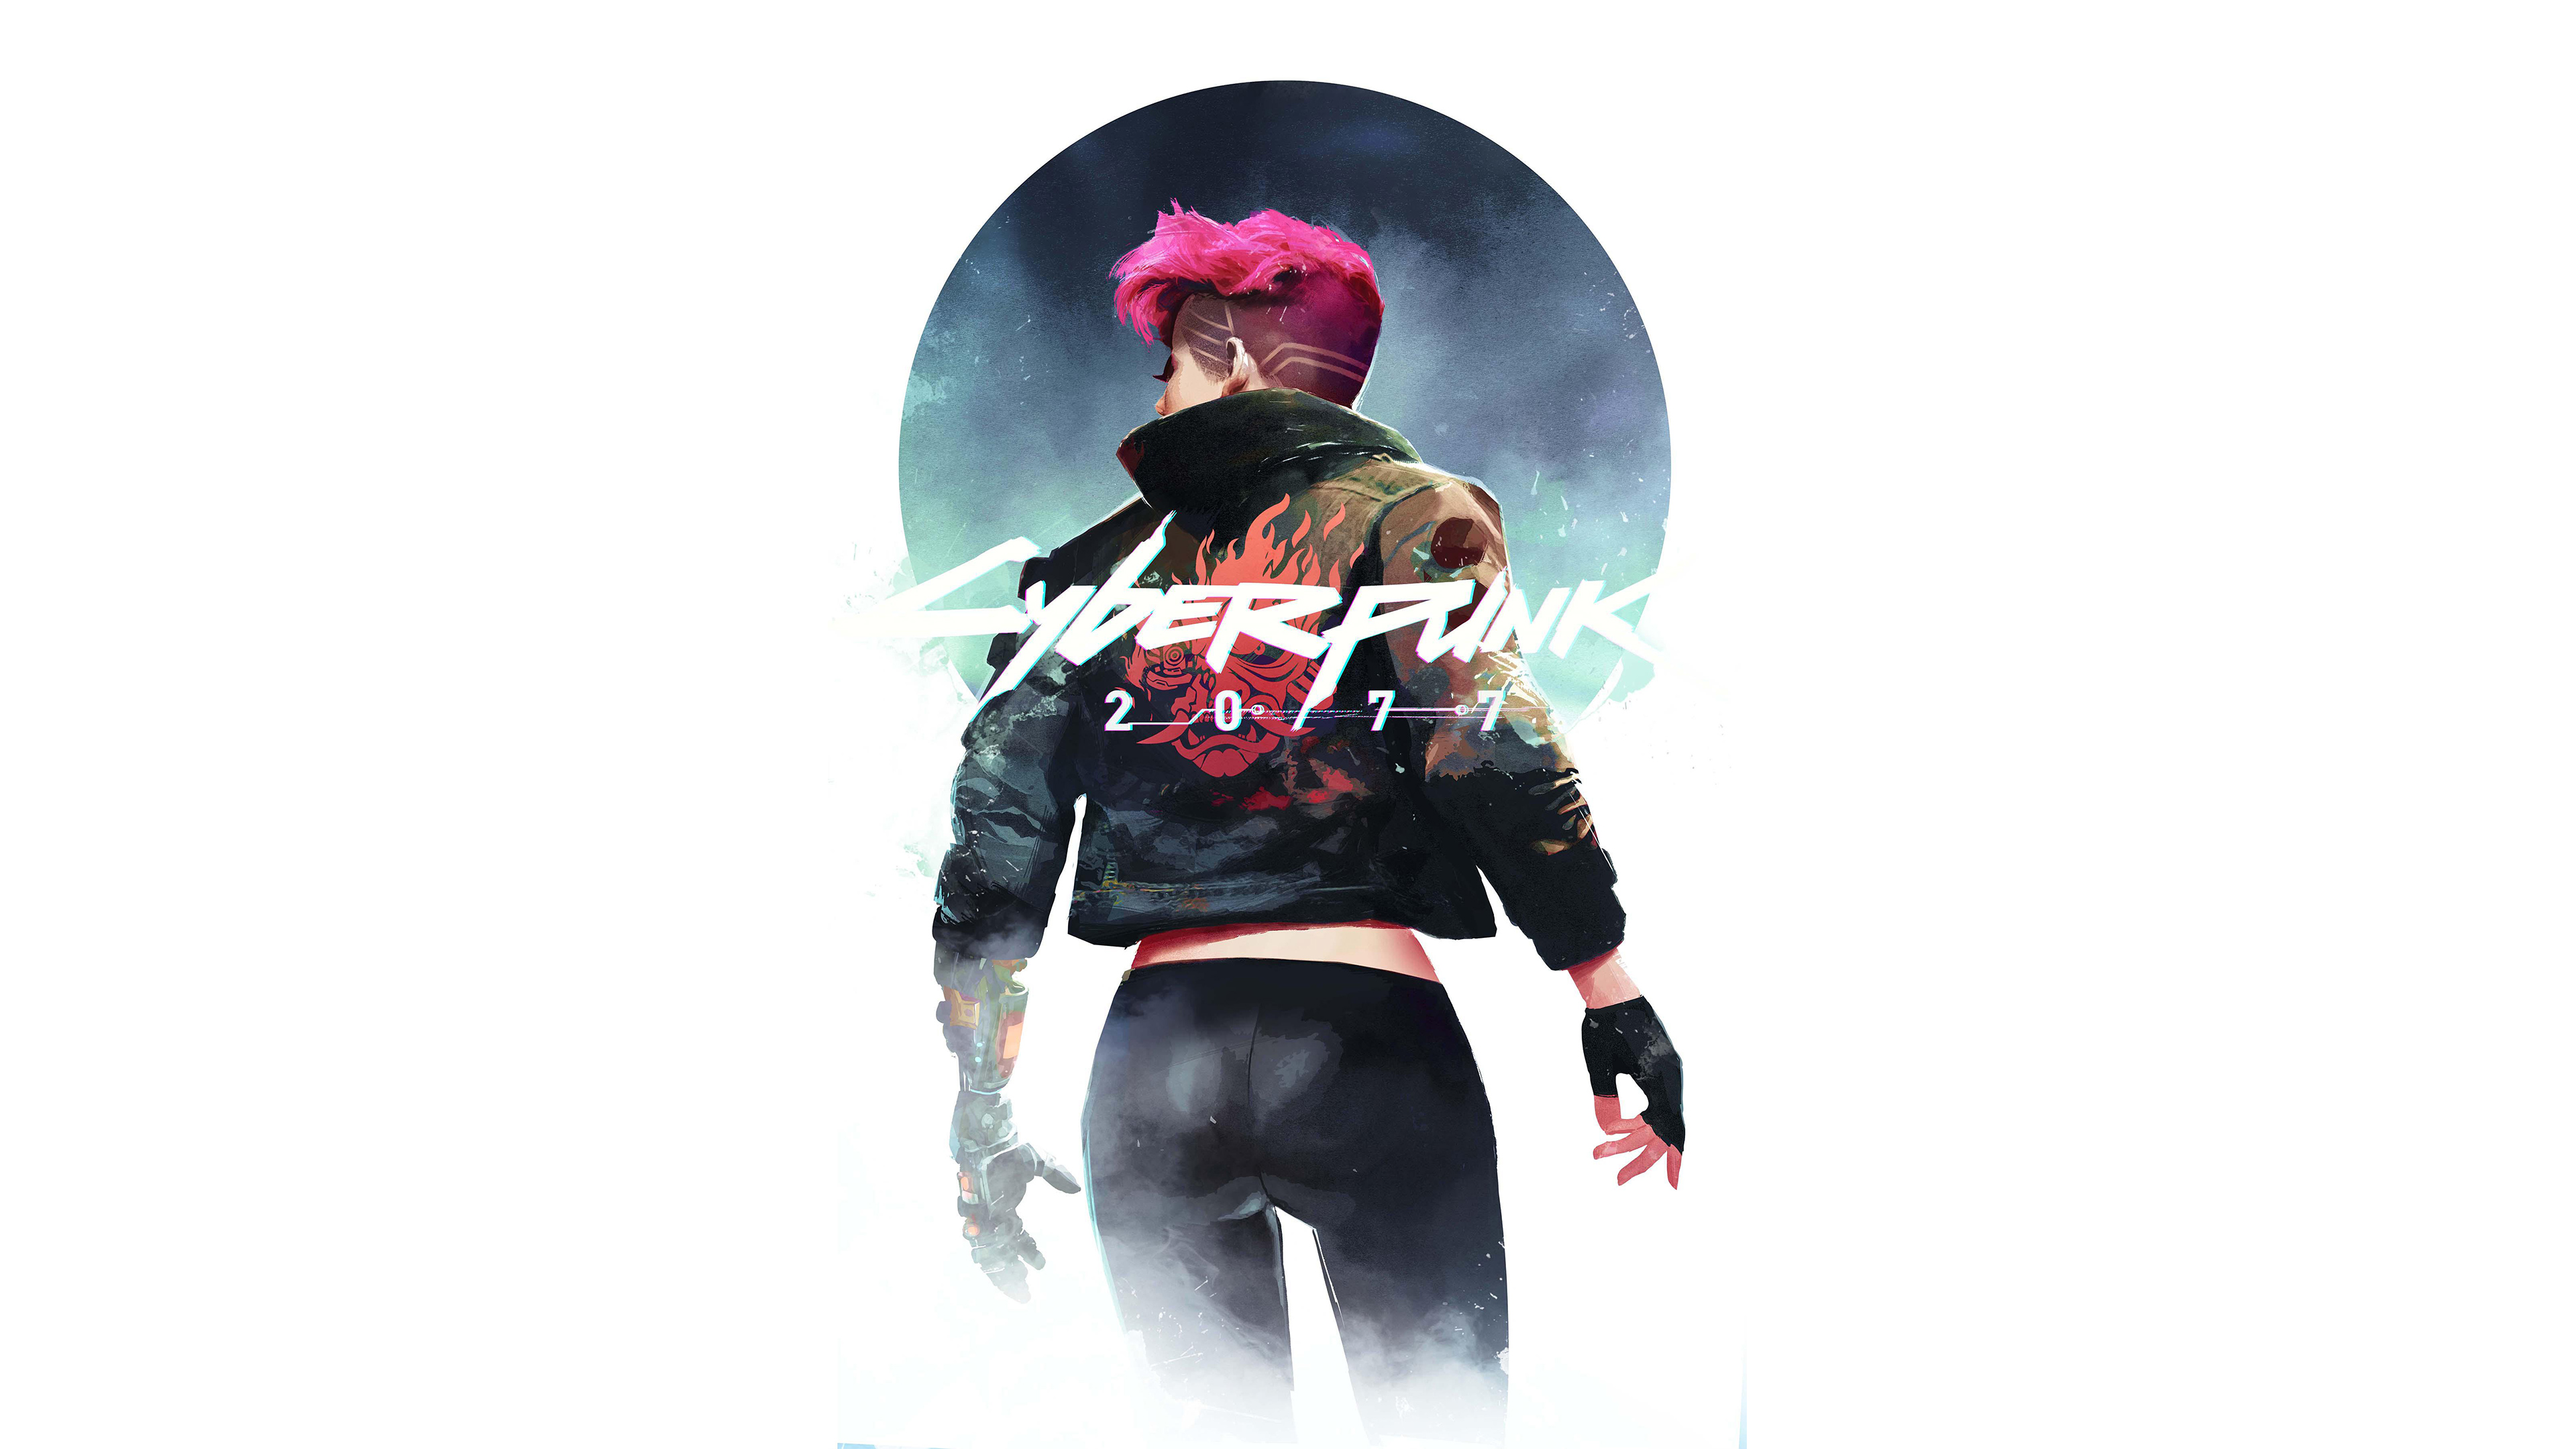 2019 Cyberpunk 2077 New 4k, HD Games, 4k Wallpapers ...